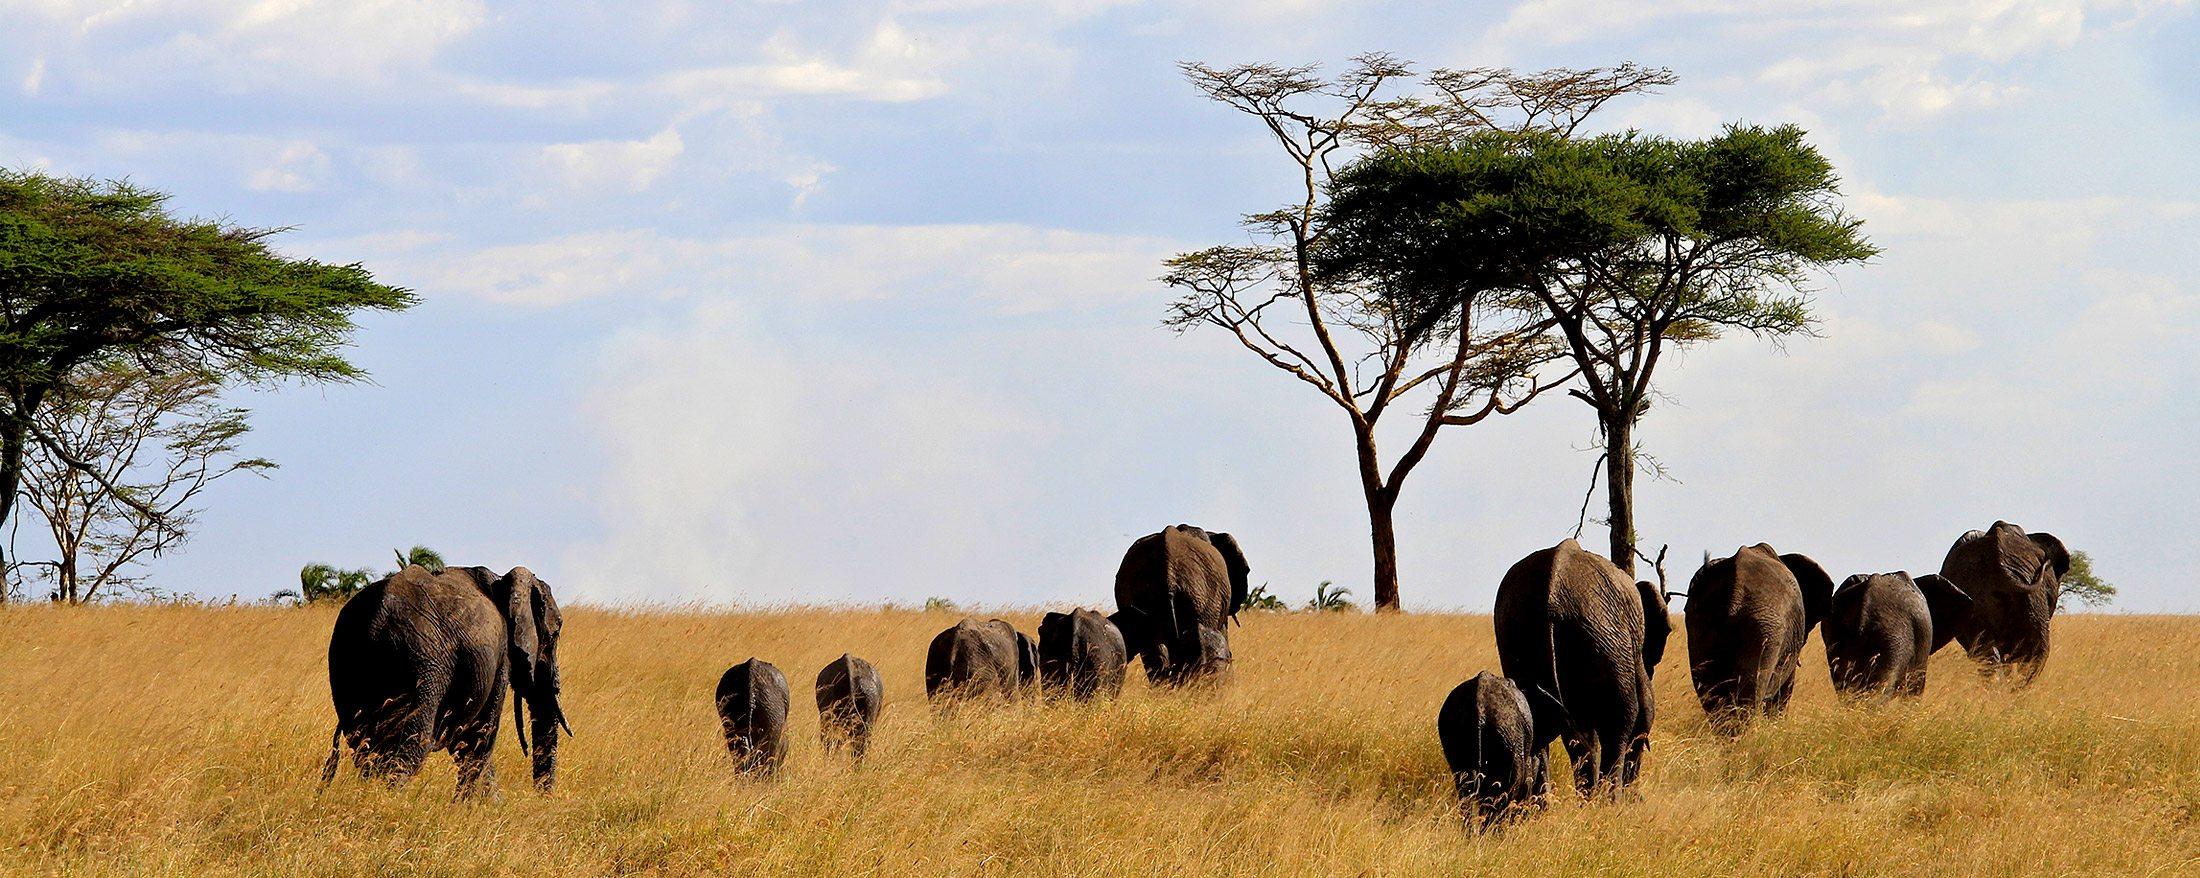 You too can embark on a Serengeti walking safari like these elephant.